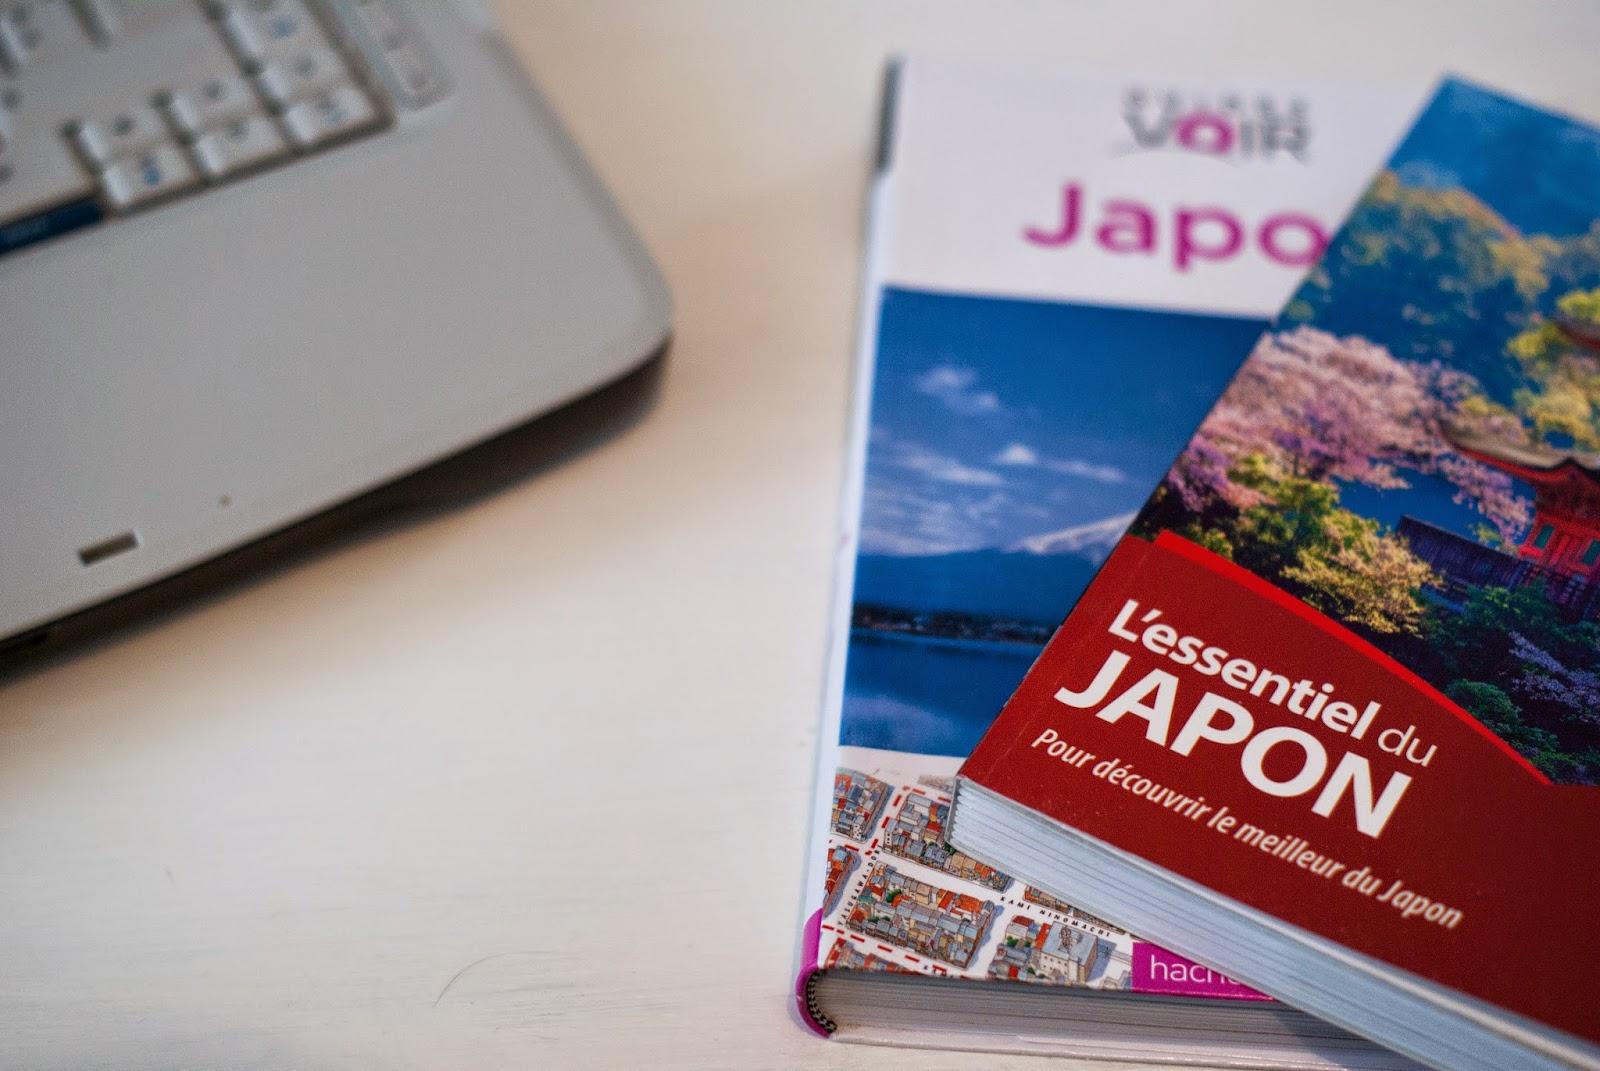 computer japan japon voyage travel